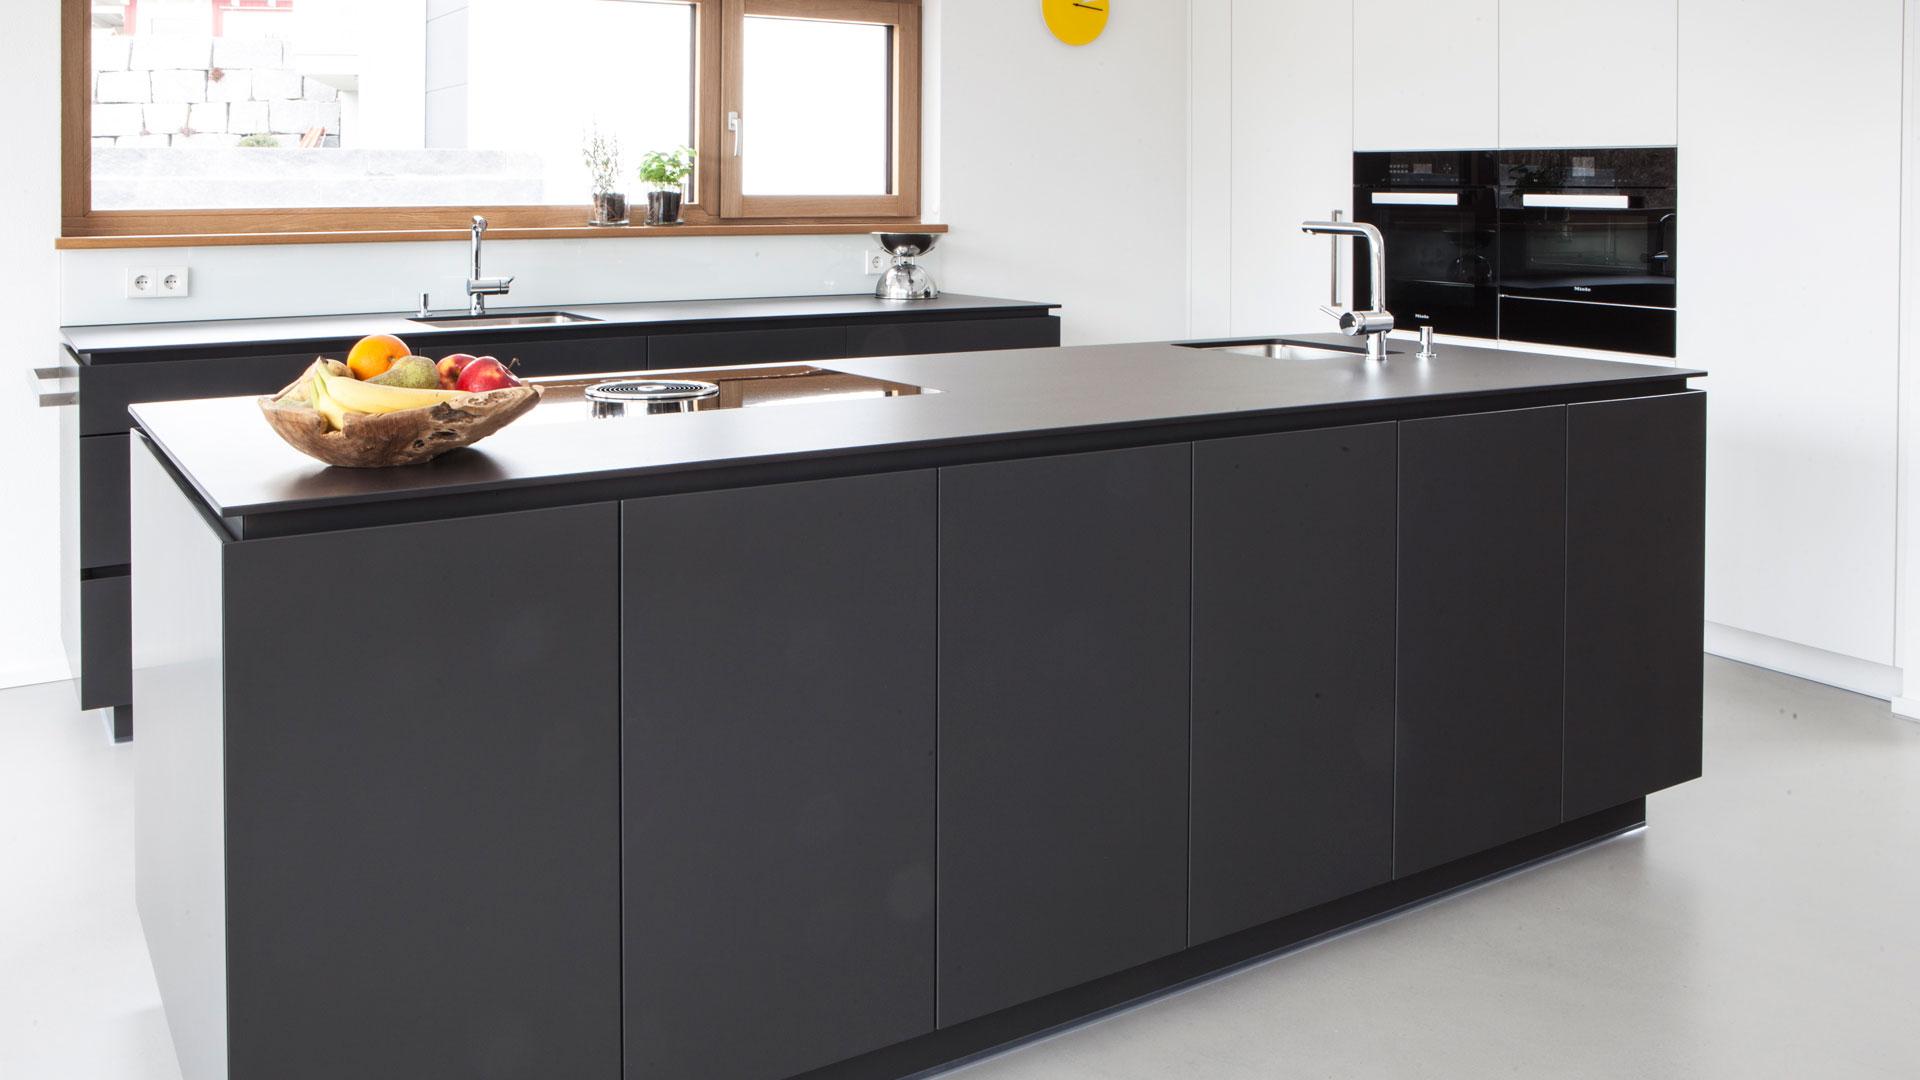 Full Size of Küche Anthrazit Mit Holz Nolte Küche Anthrazit Vicco Küche Anthrazit Küche Anthrazit Erfahrungen Küche Küche Anthrazit